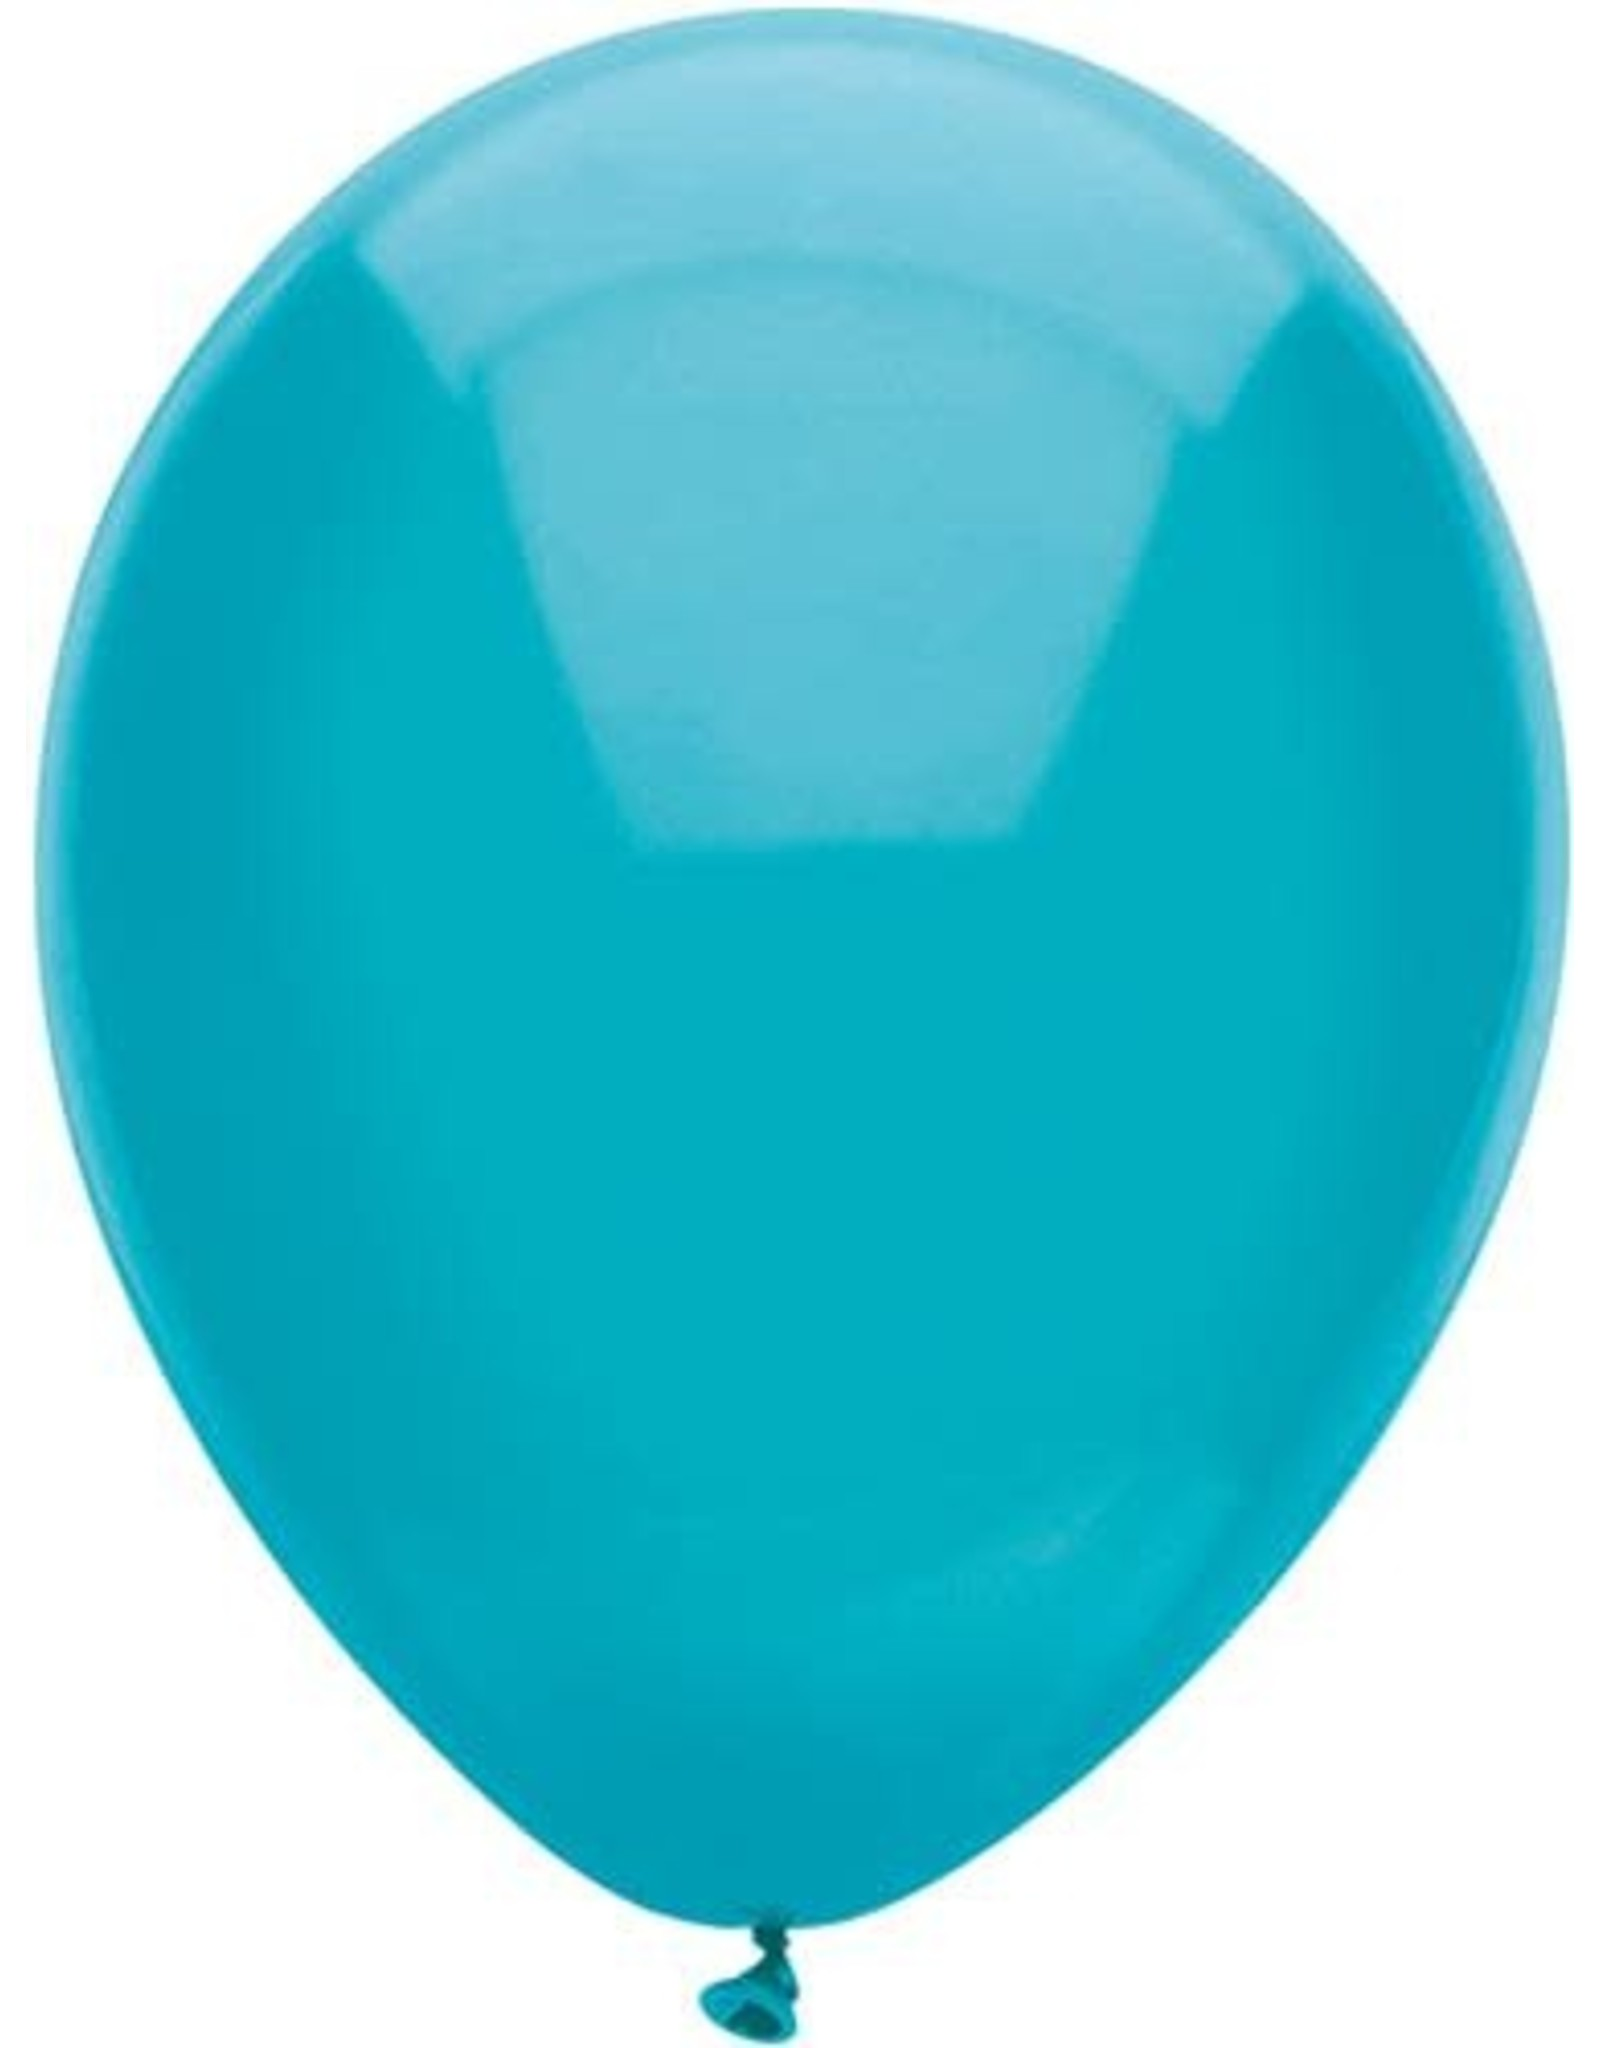 Ballonnen Uni Groenblauw (30 cm, 100 stuks)